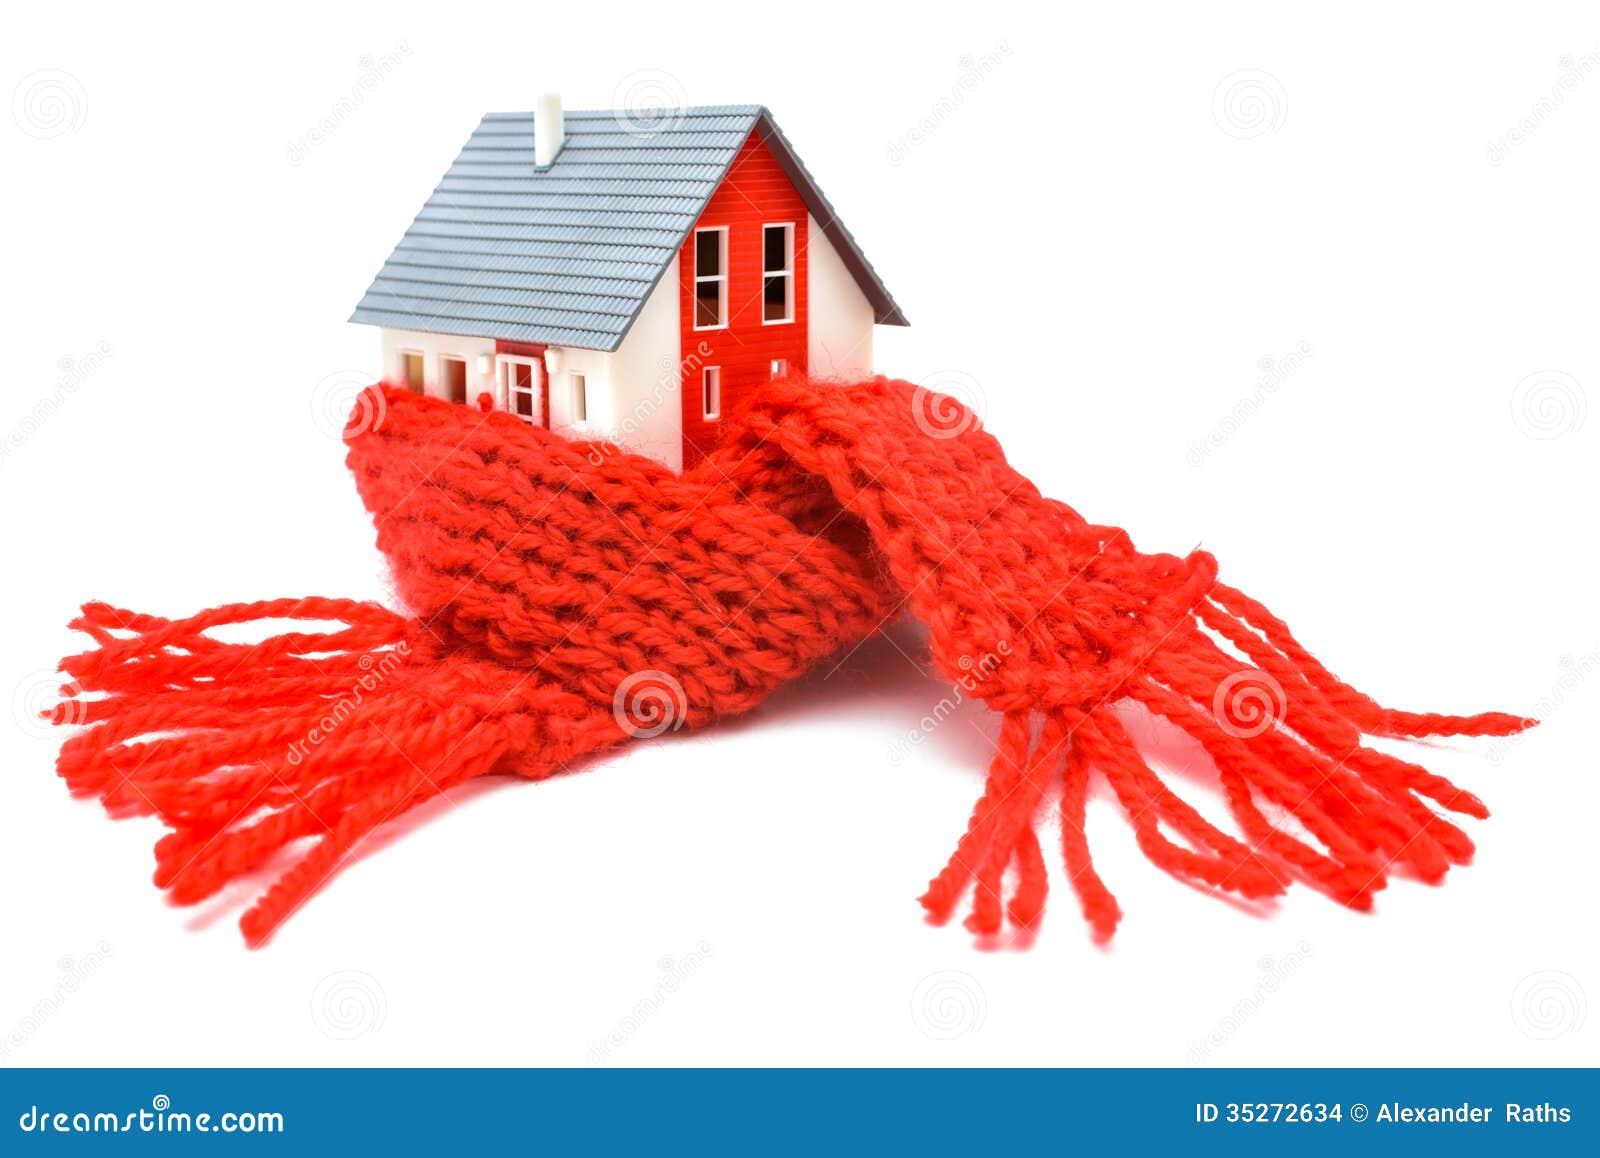 Isolation thermique